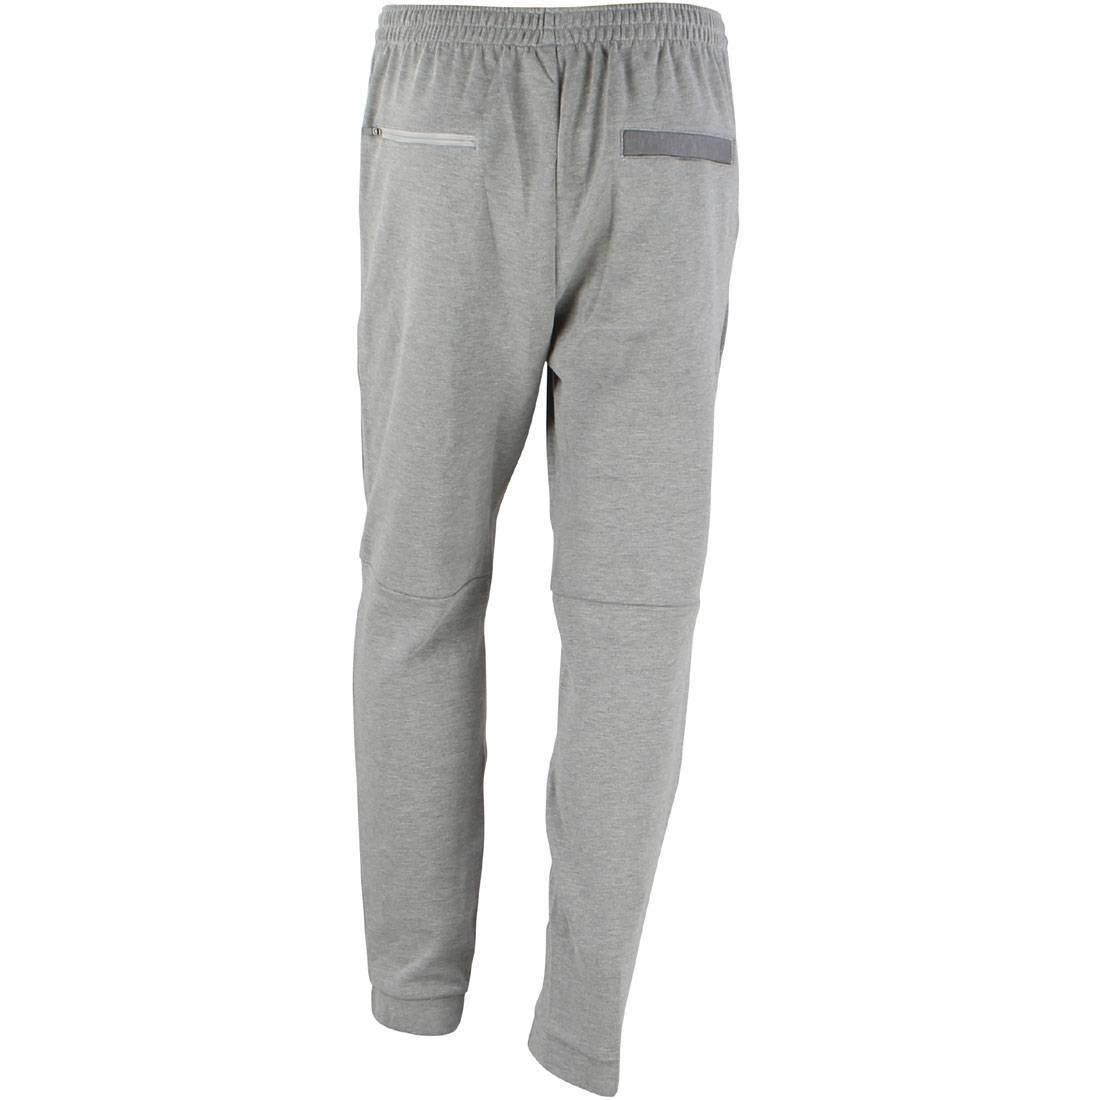 872ee23da040c0  90.00 724493-021 Jordan Men Air Jordan Knit City Pants (dk grey ...